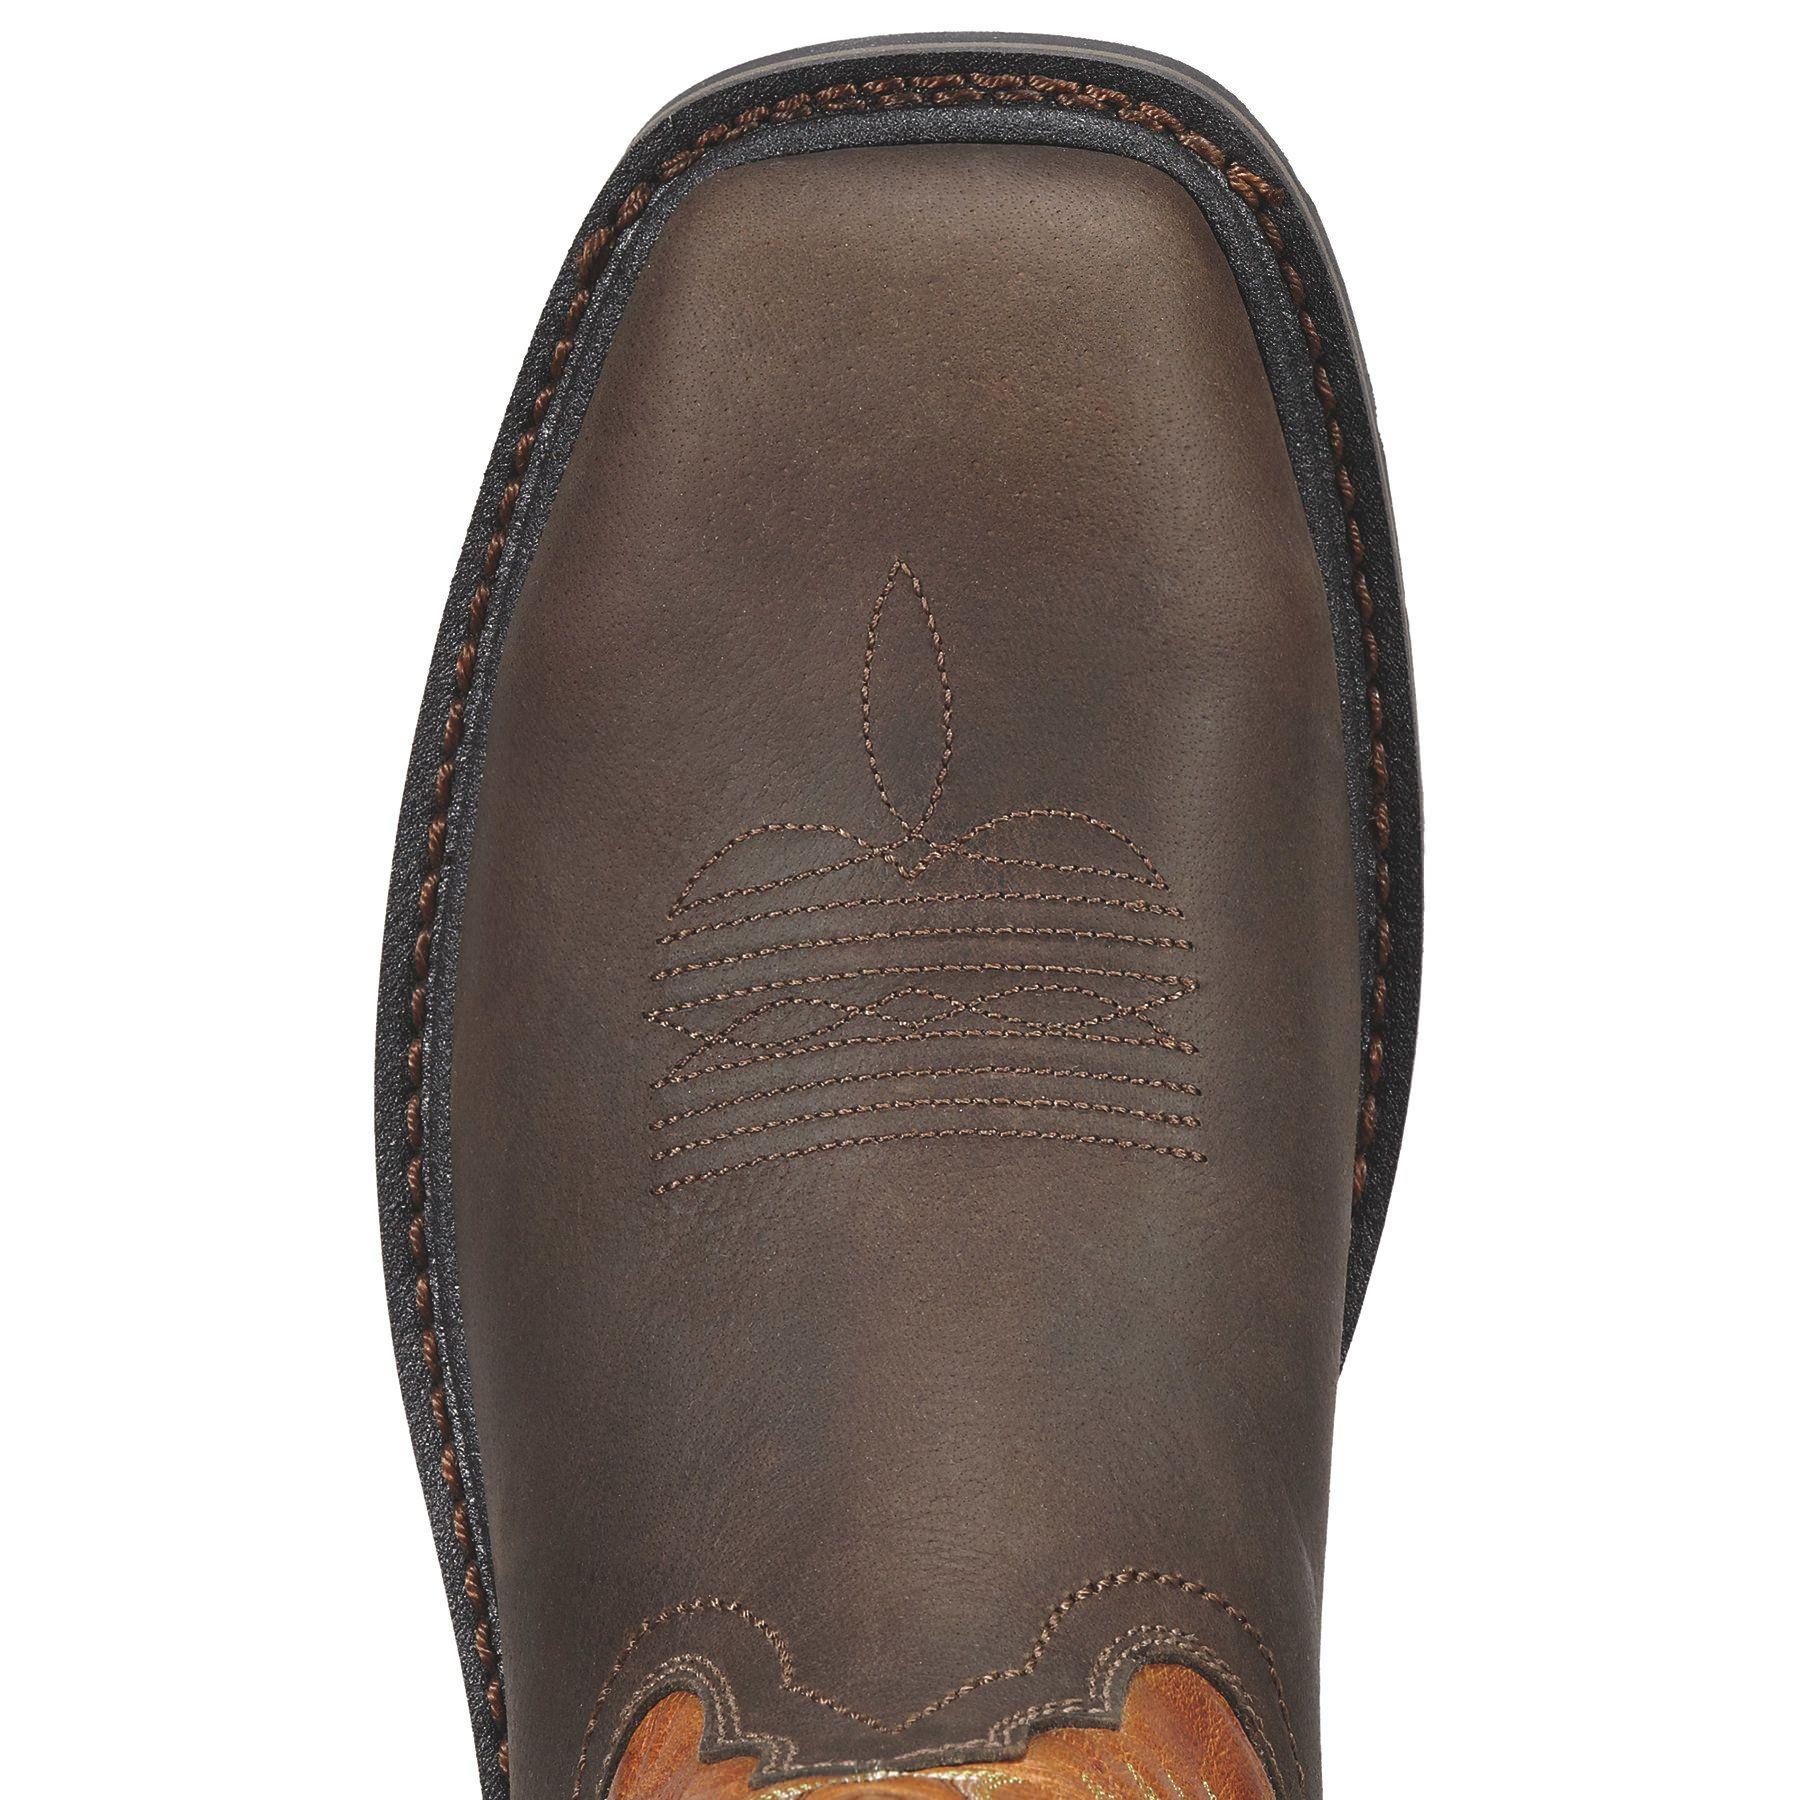 hot sale online good service most popular Men's Sierra Wide Square Toe Steel Toe Work Boots in Aged ...